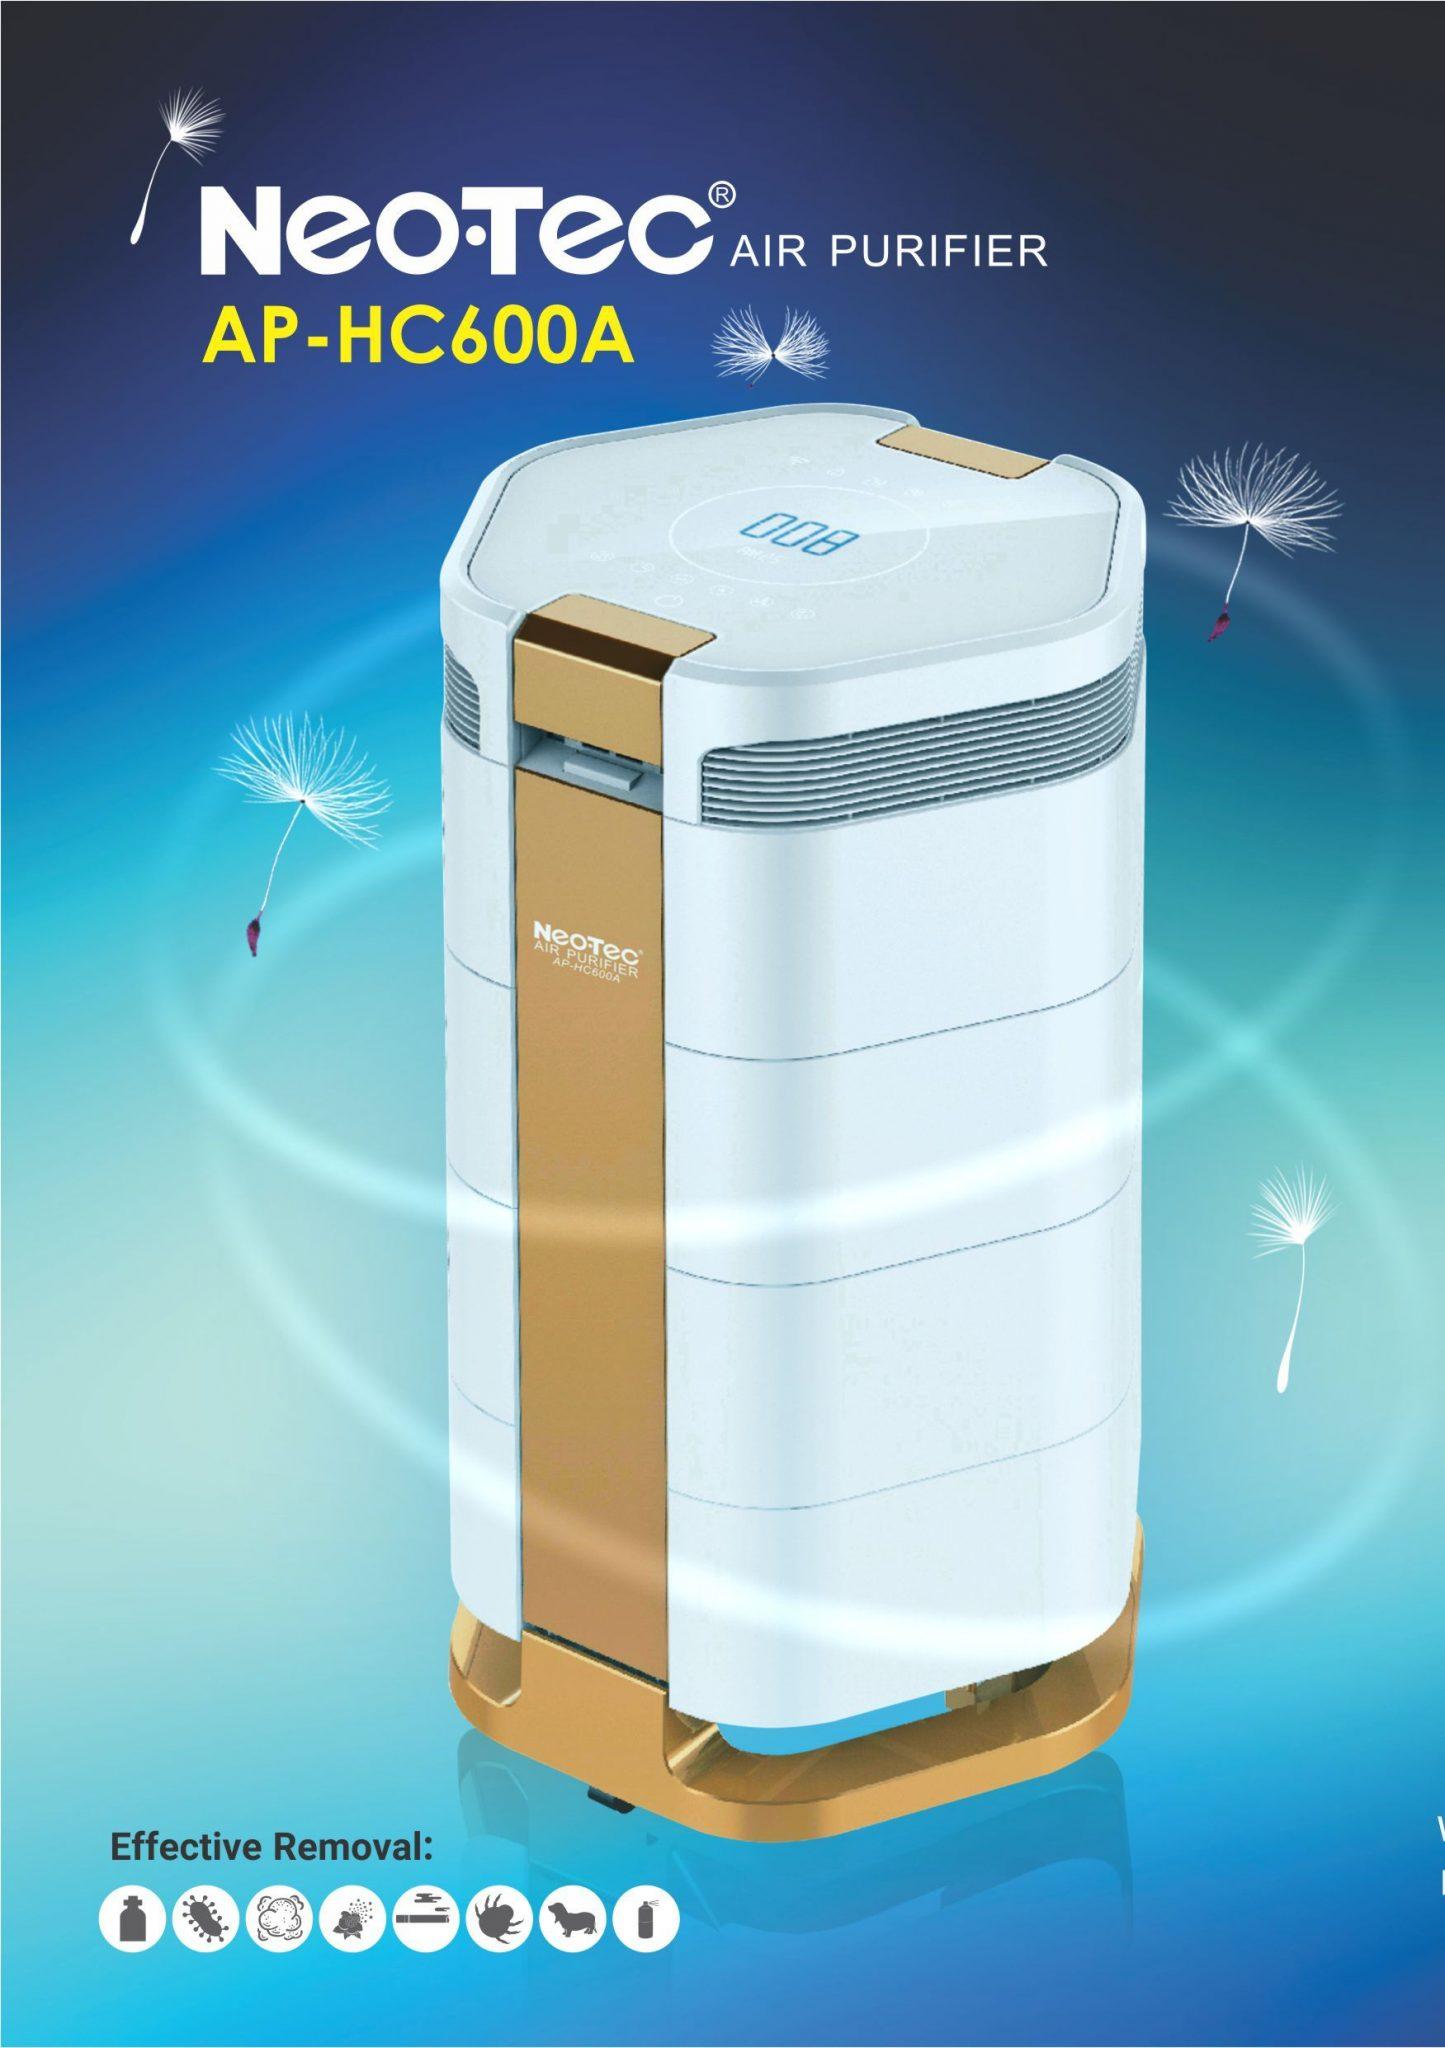 دستگاه تصفیه هوا AP-HC600A